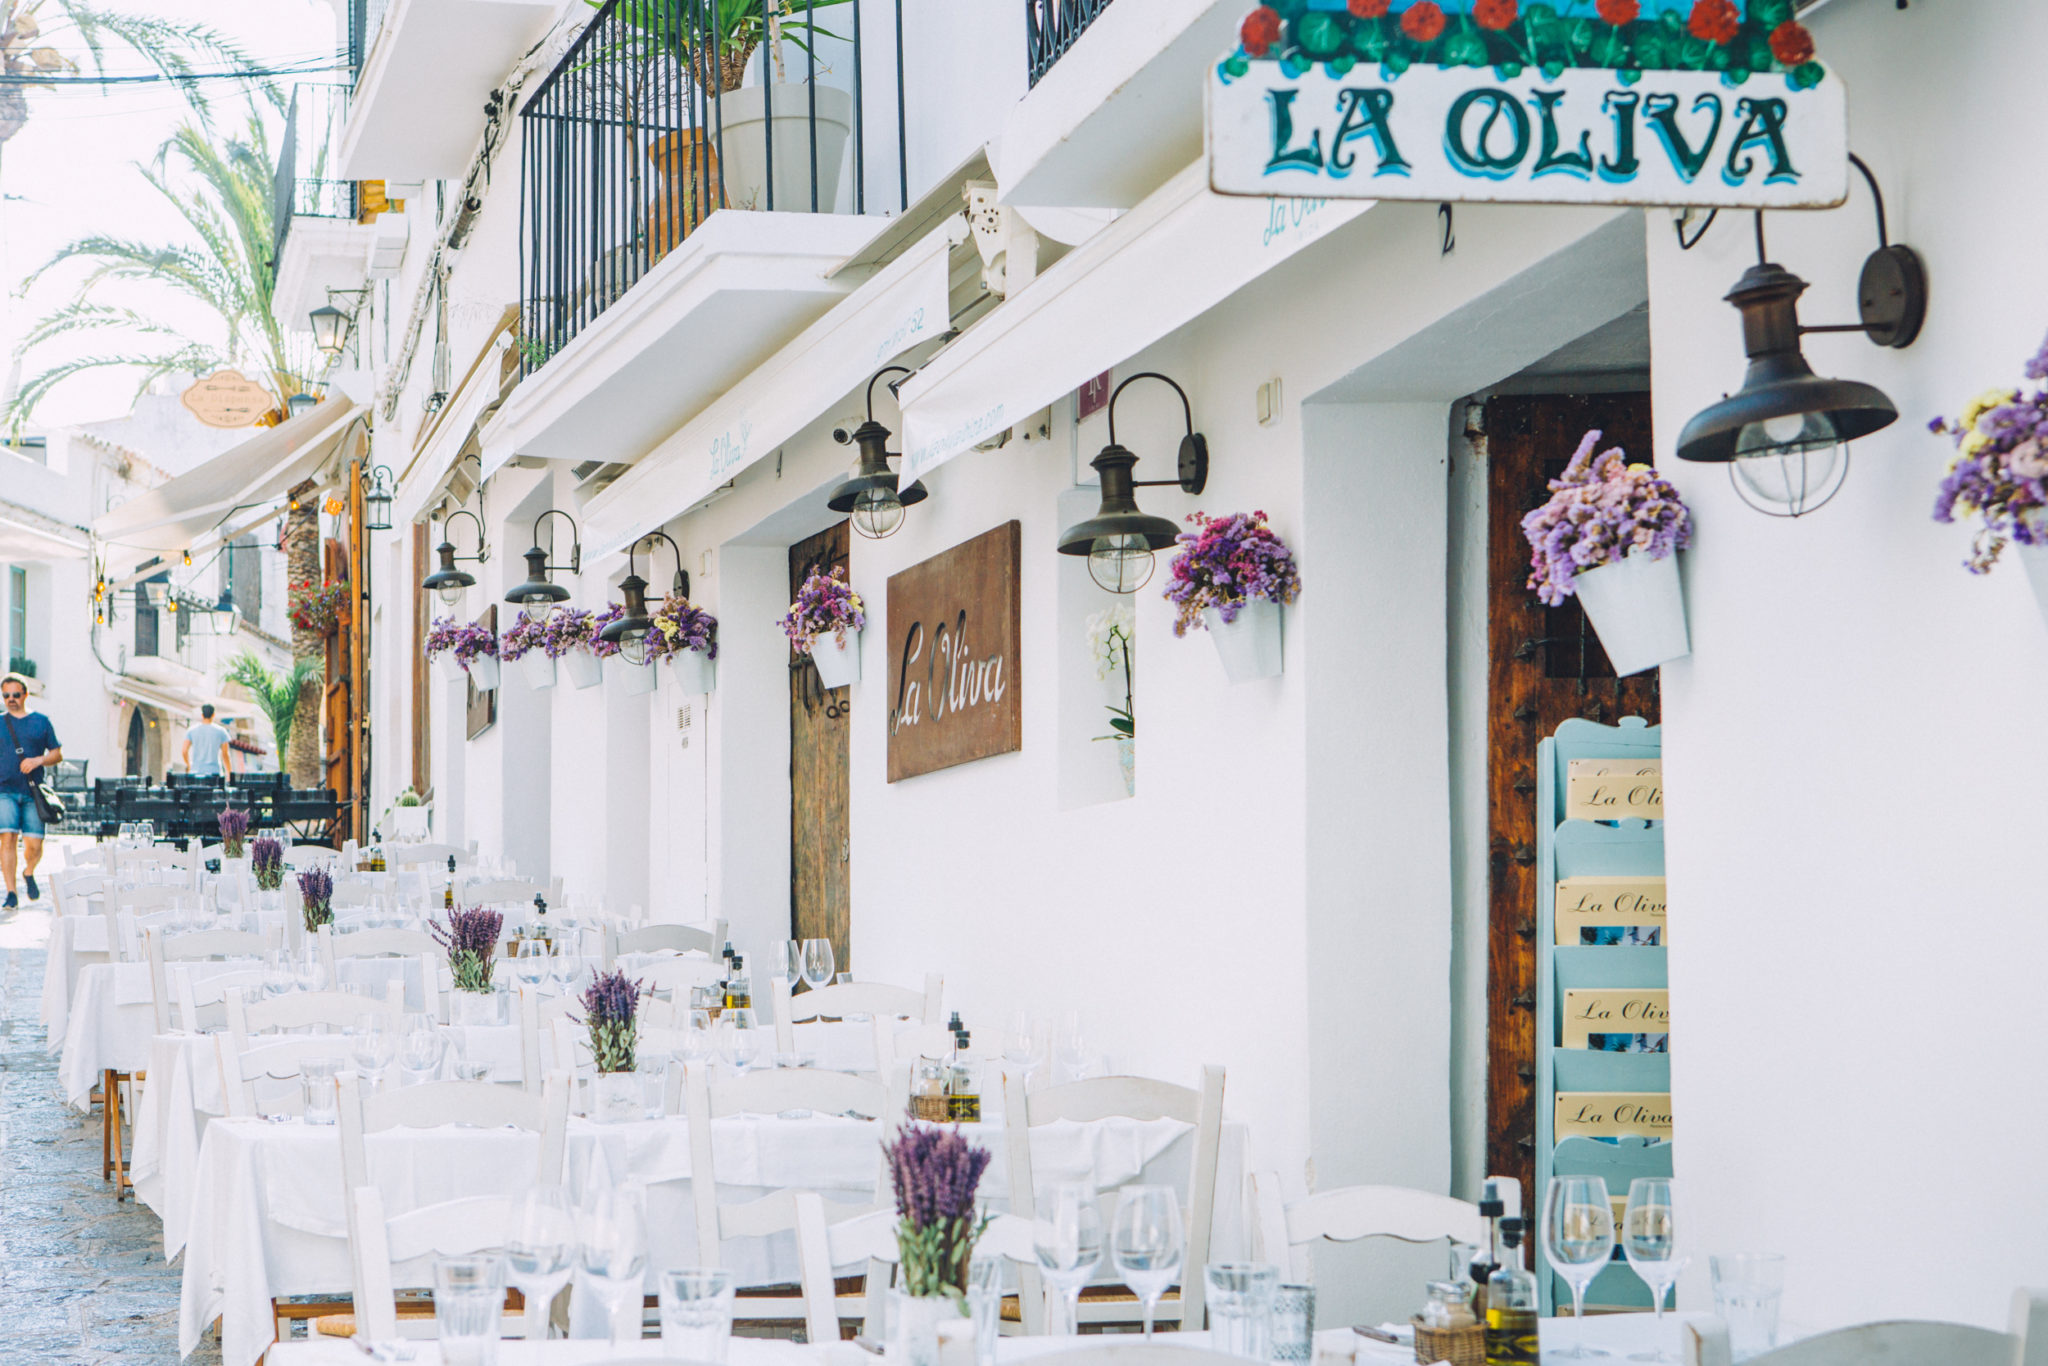 The best restaurants Ibiza borrows from film